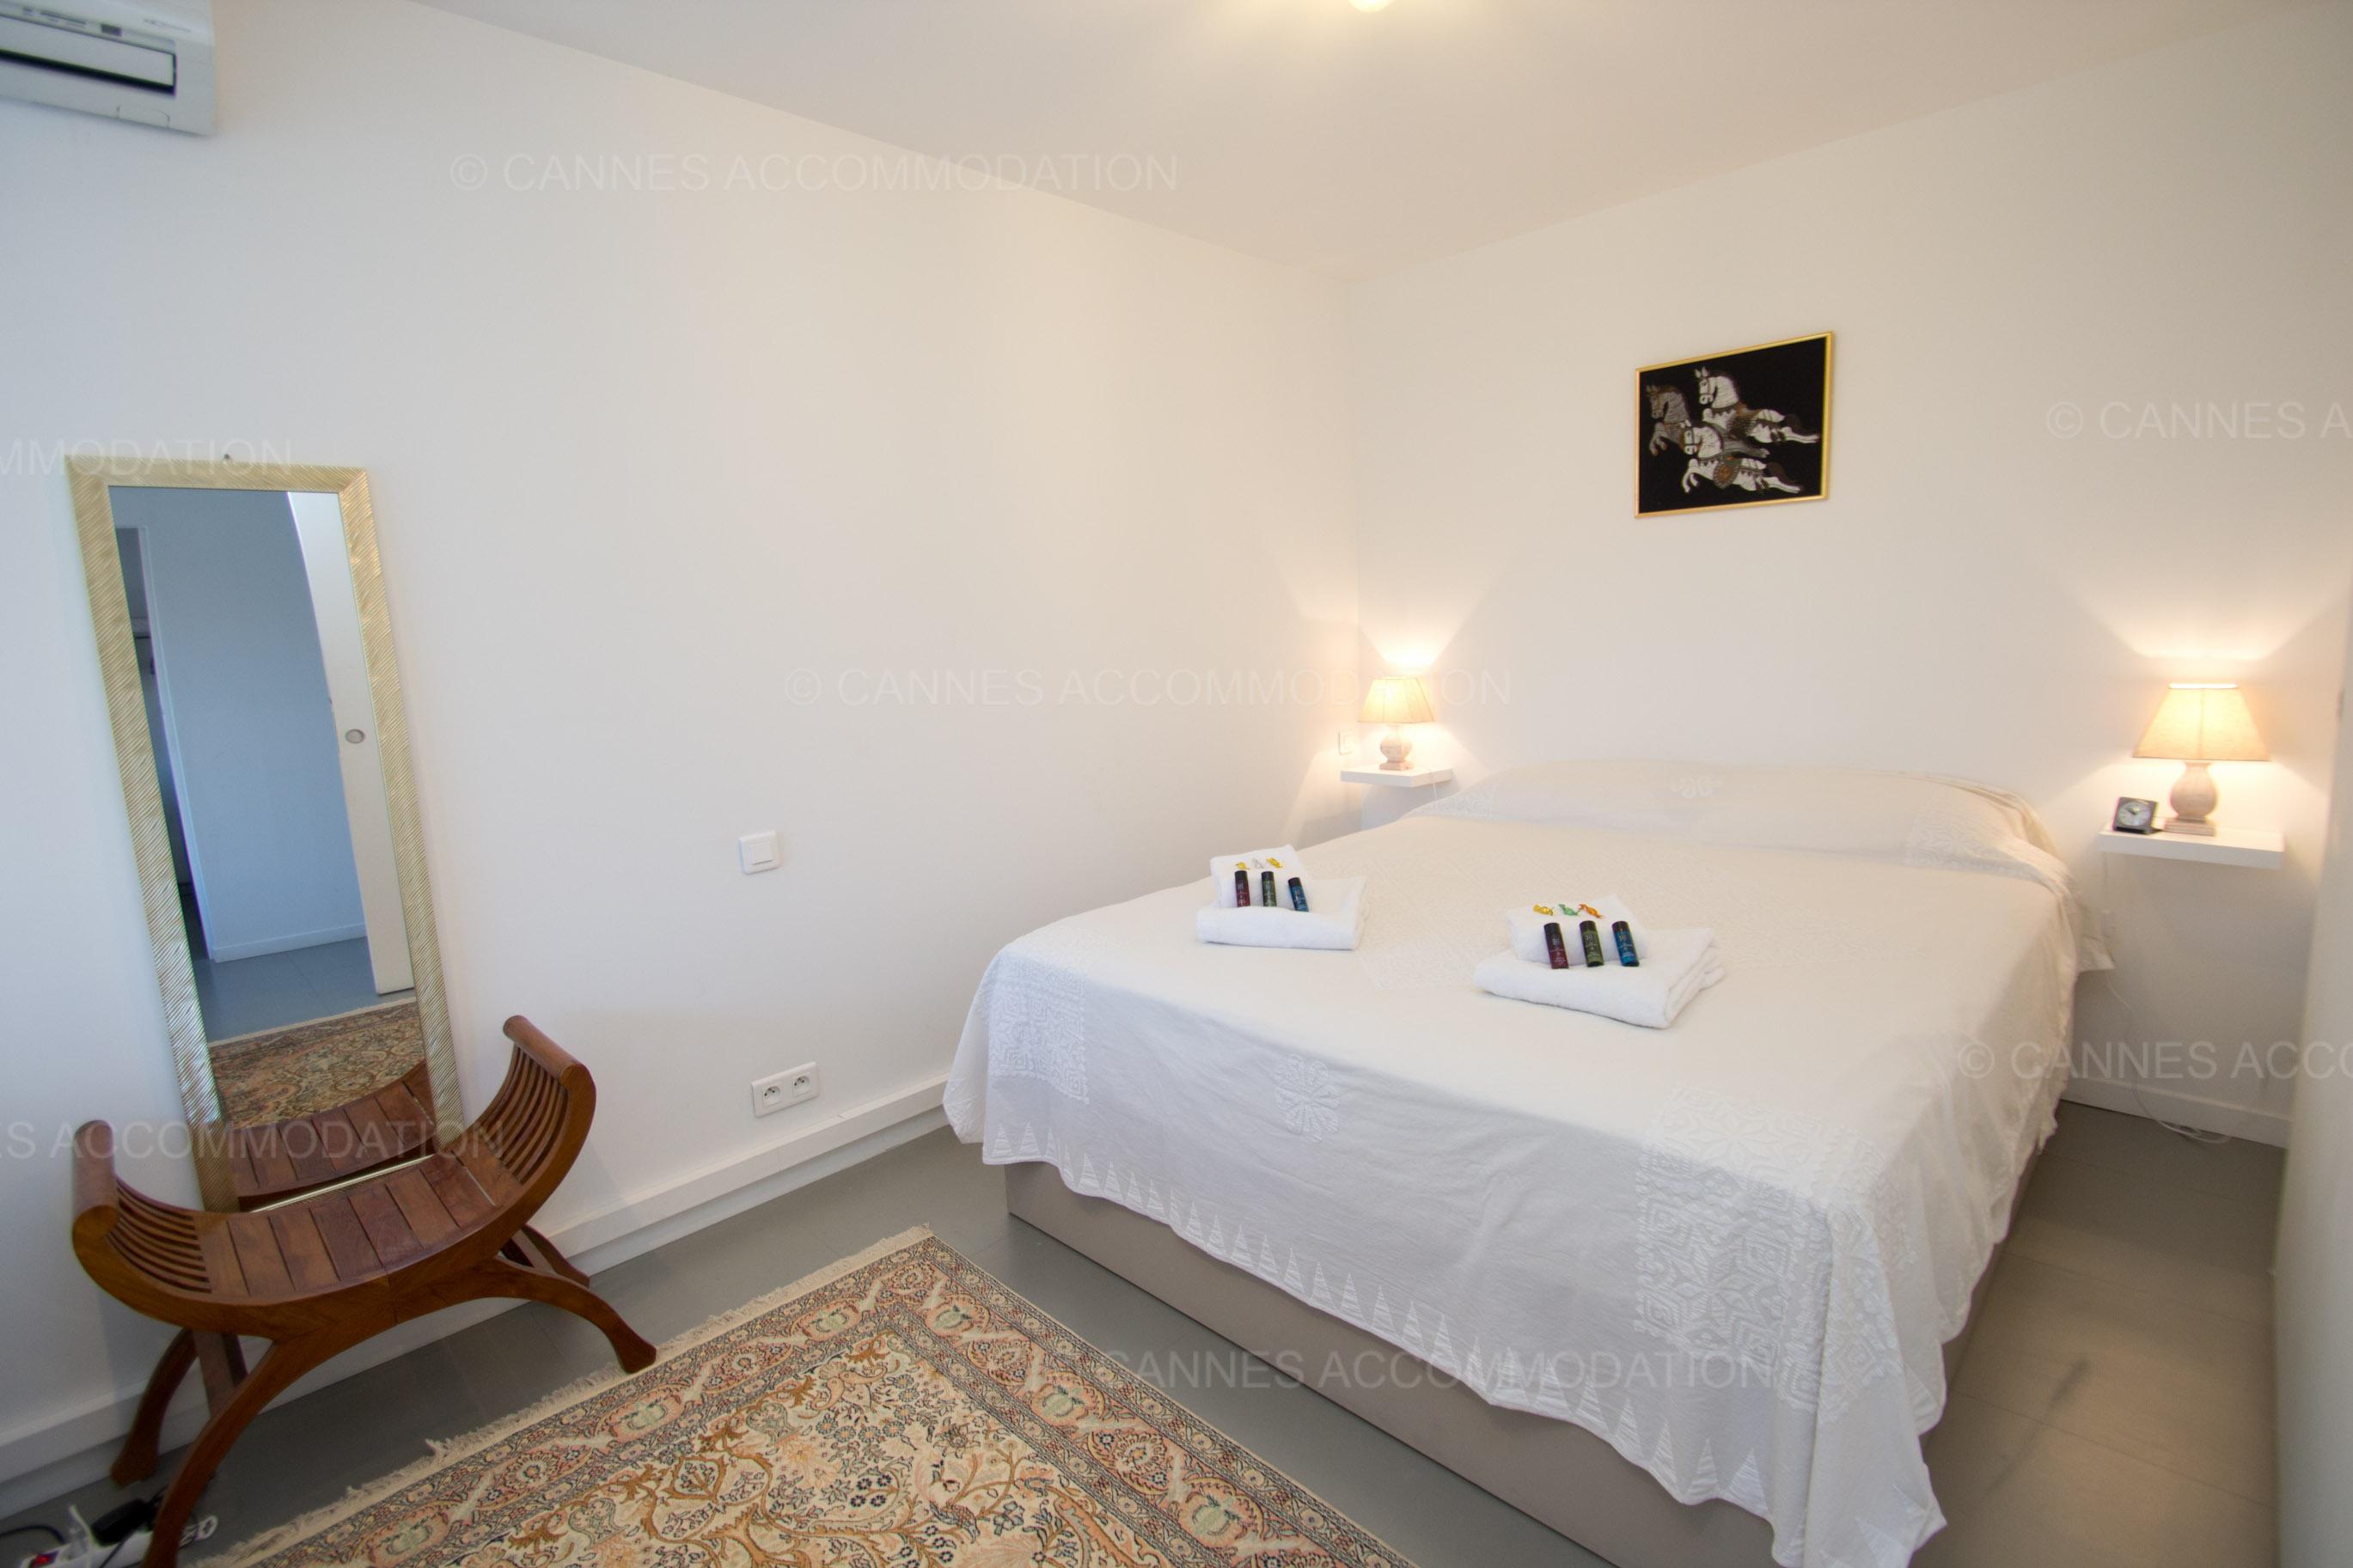 Appartement 2 chambres louer cannes secteur carlton martinez samsara cannes accommodation - Prix chambre carlton cannes ...